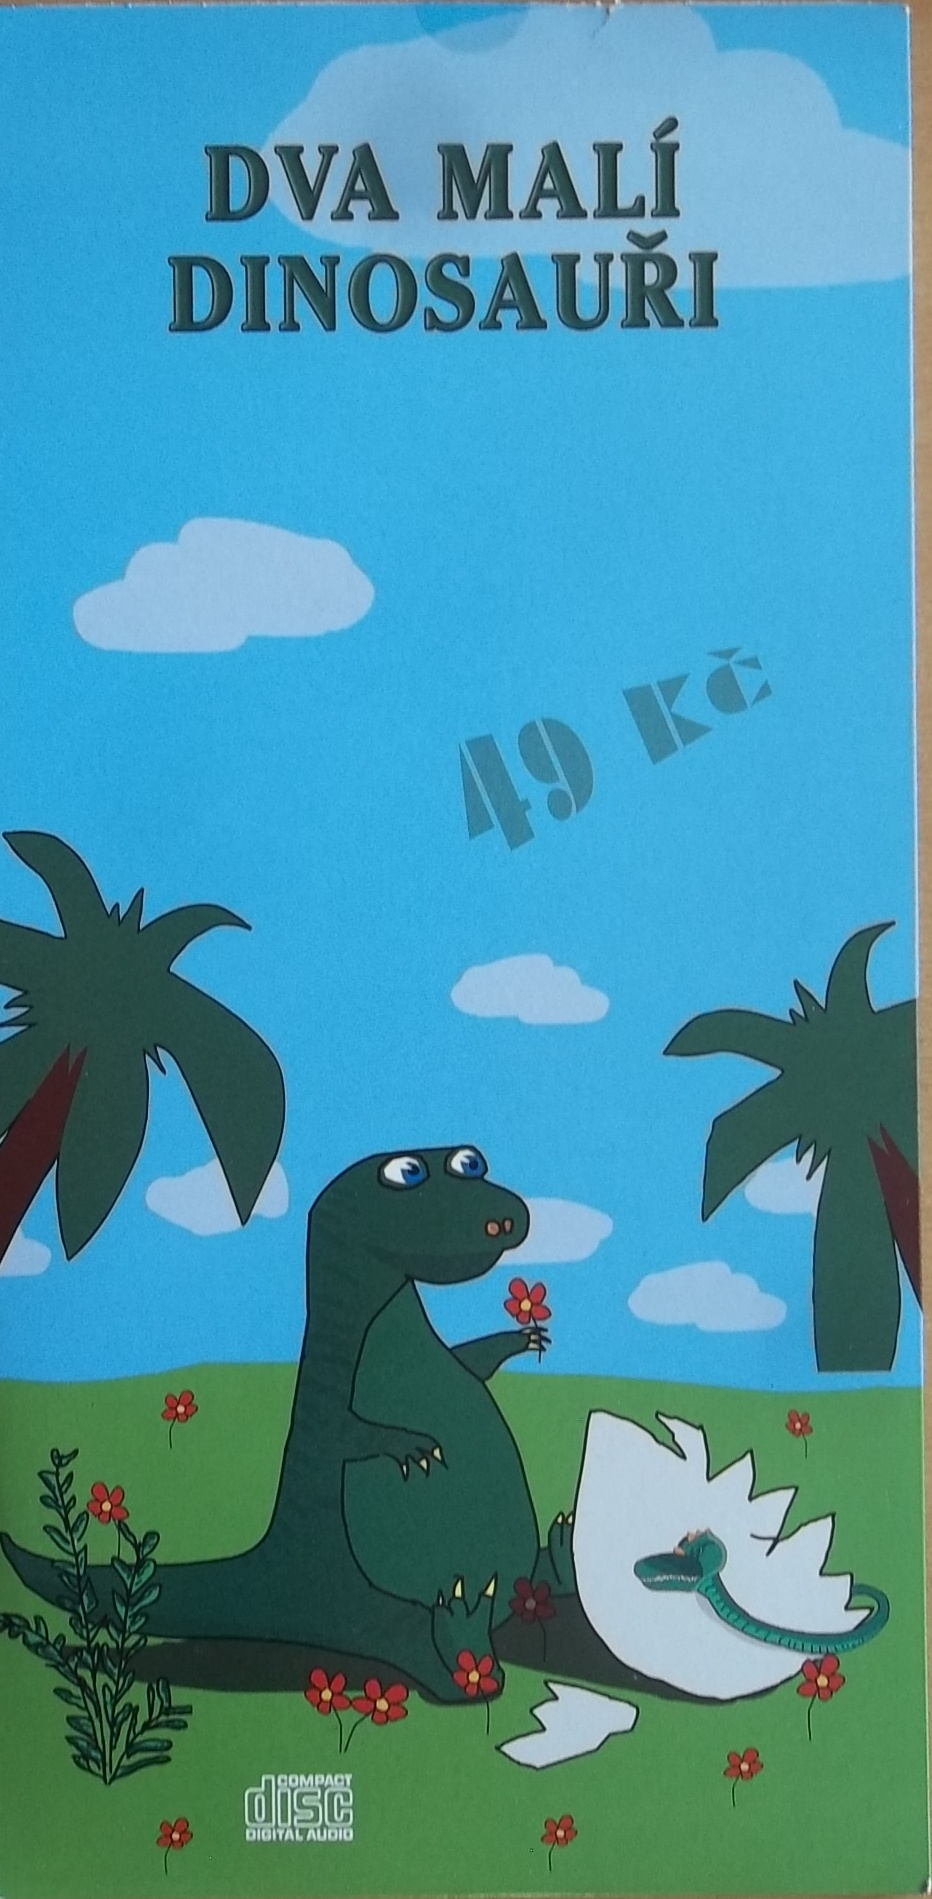 Dva malí dinosauři CD